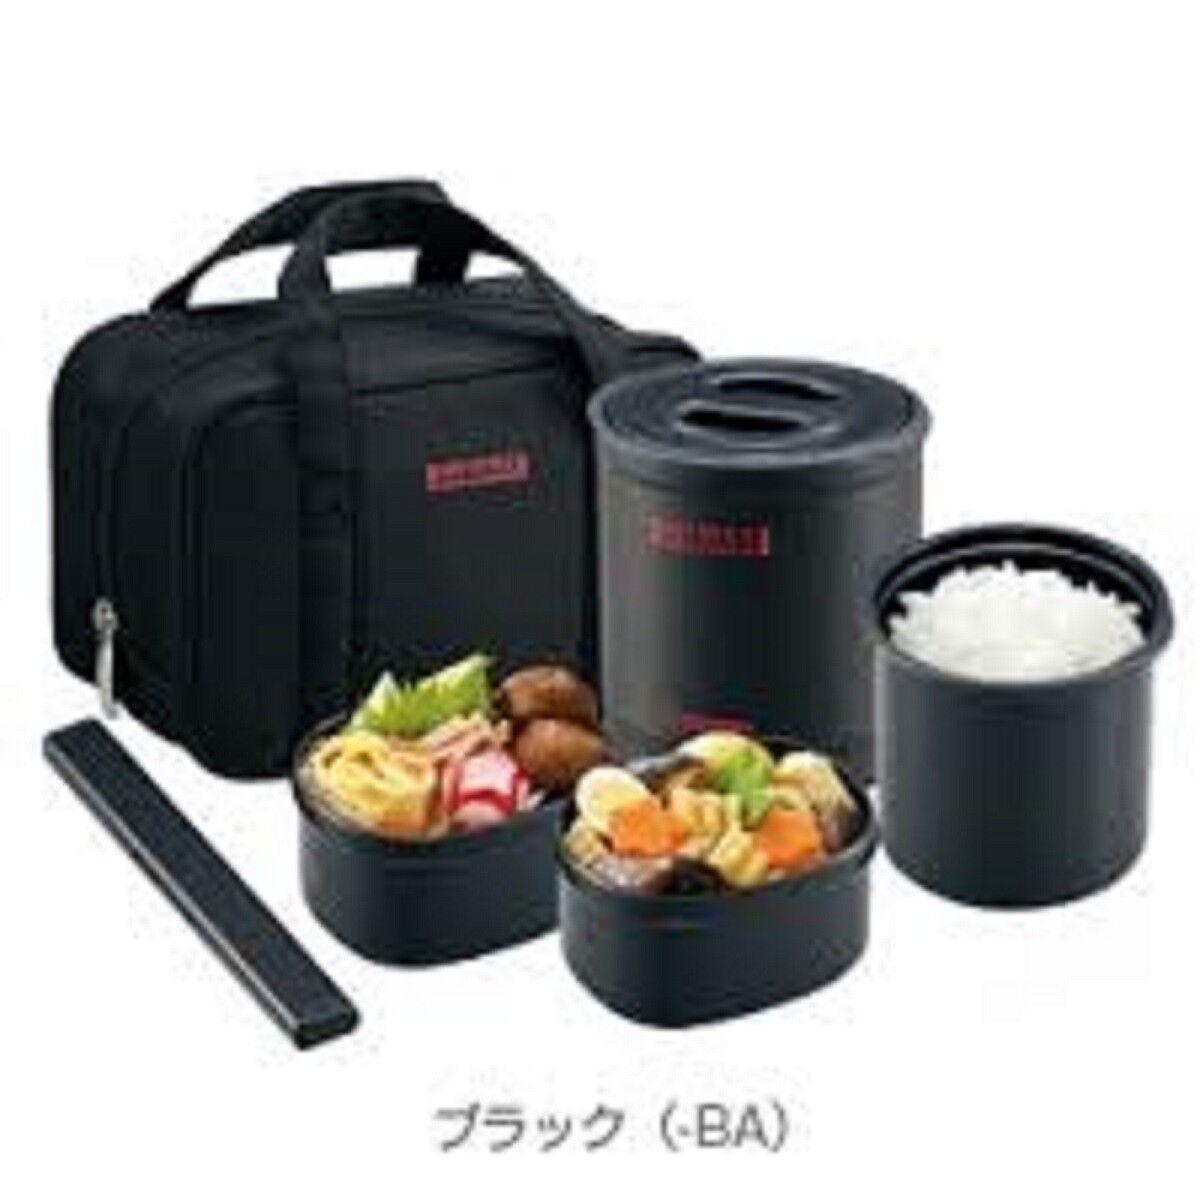 ZOJIRUSHI Thermal Bento lunch box Food jar with bag Black fr